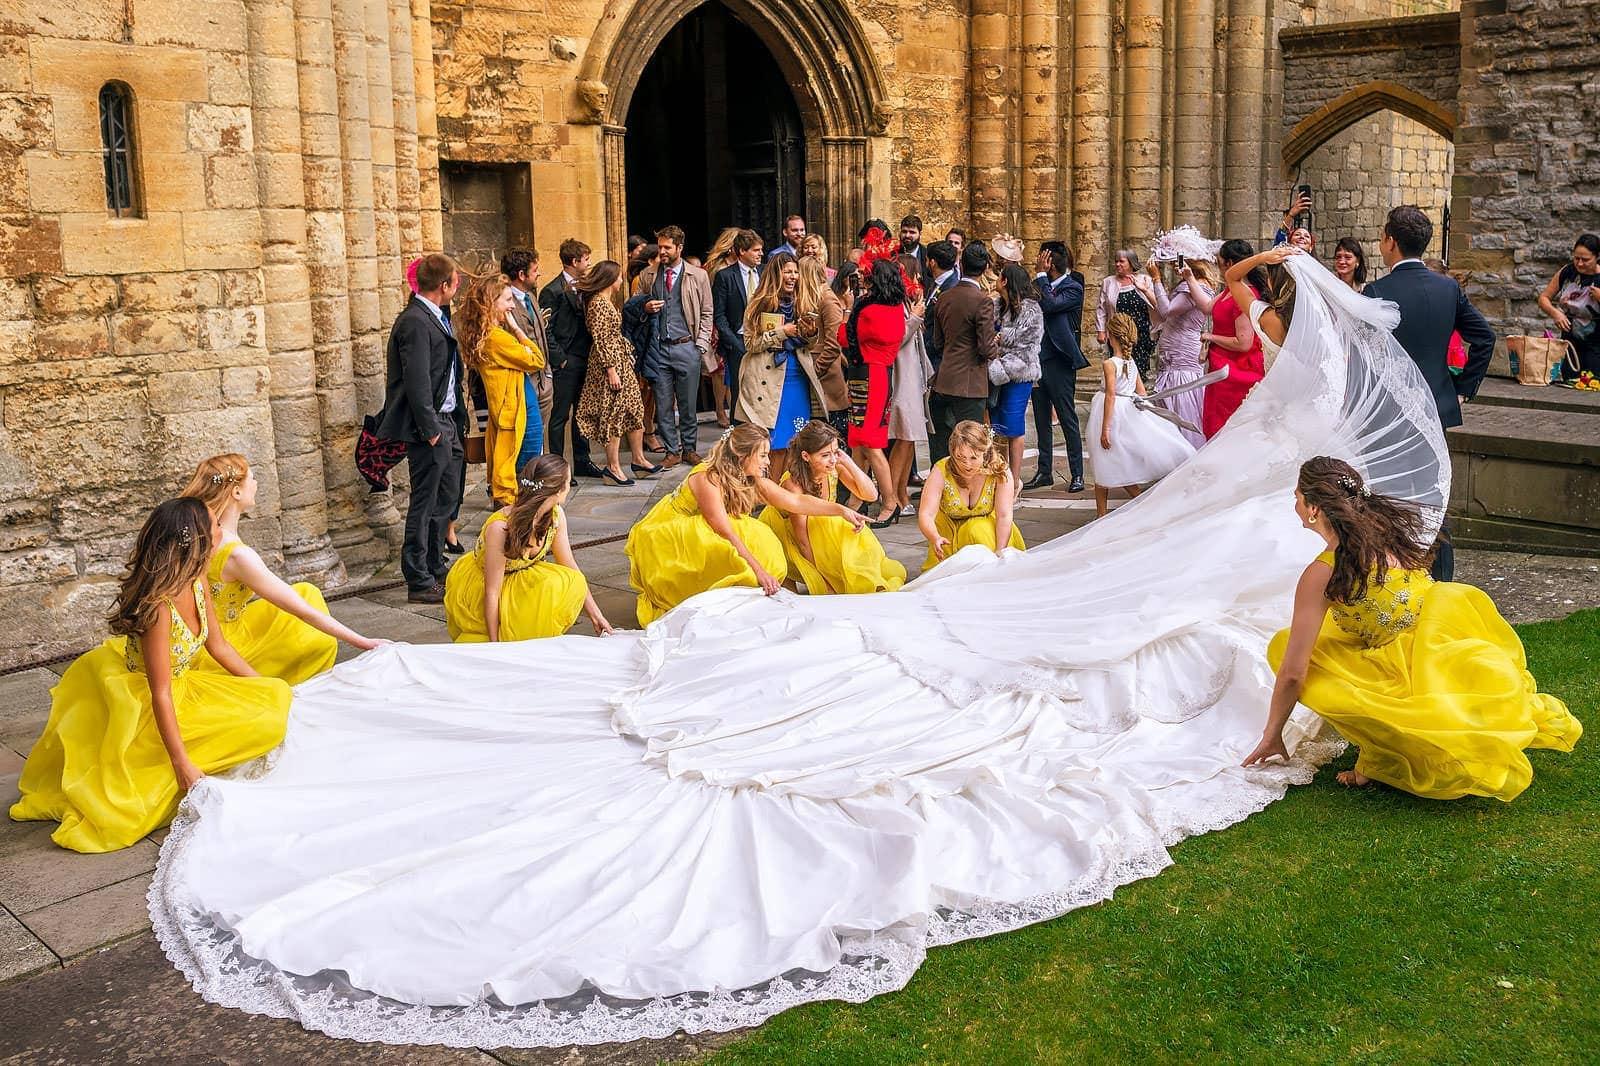 Cotswolds wedding photographer Dan Morris